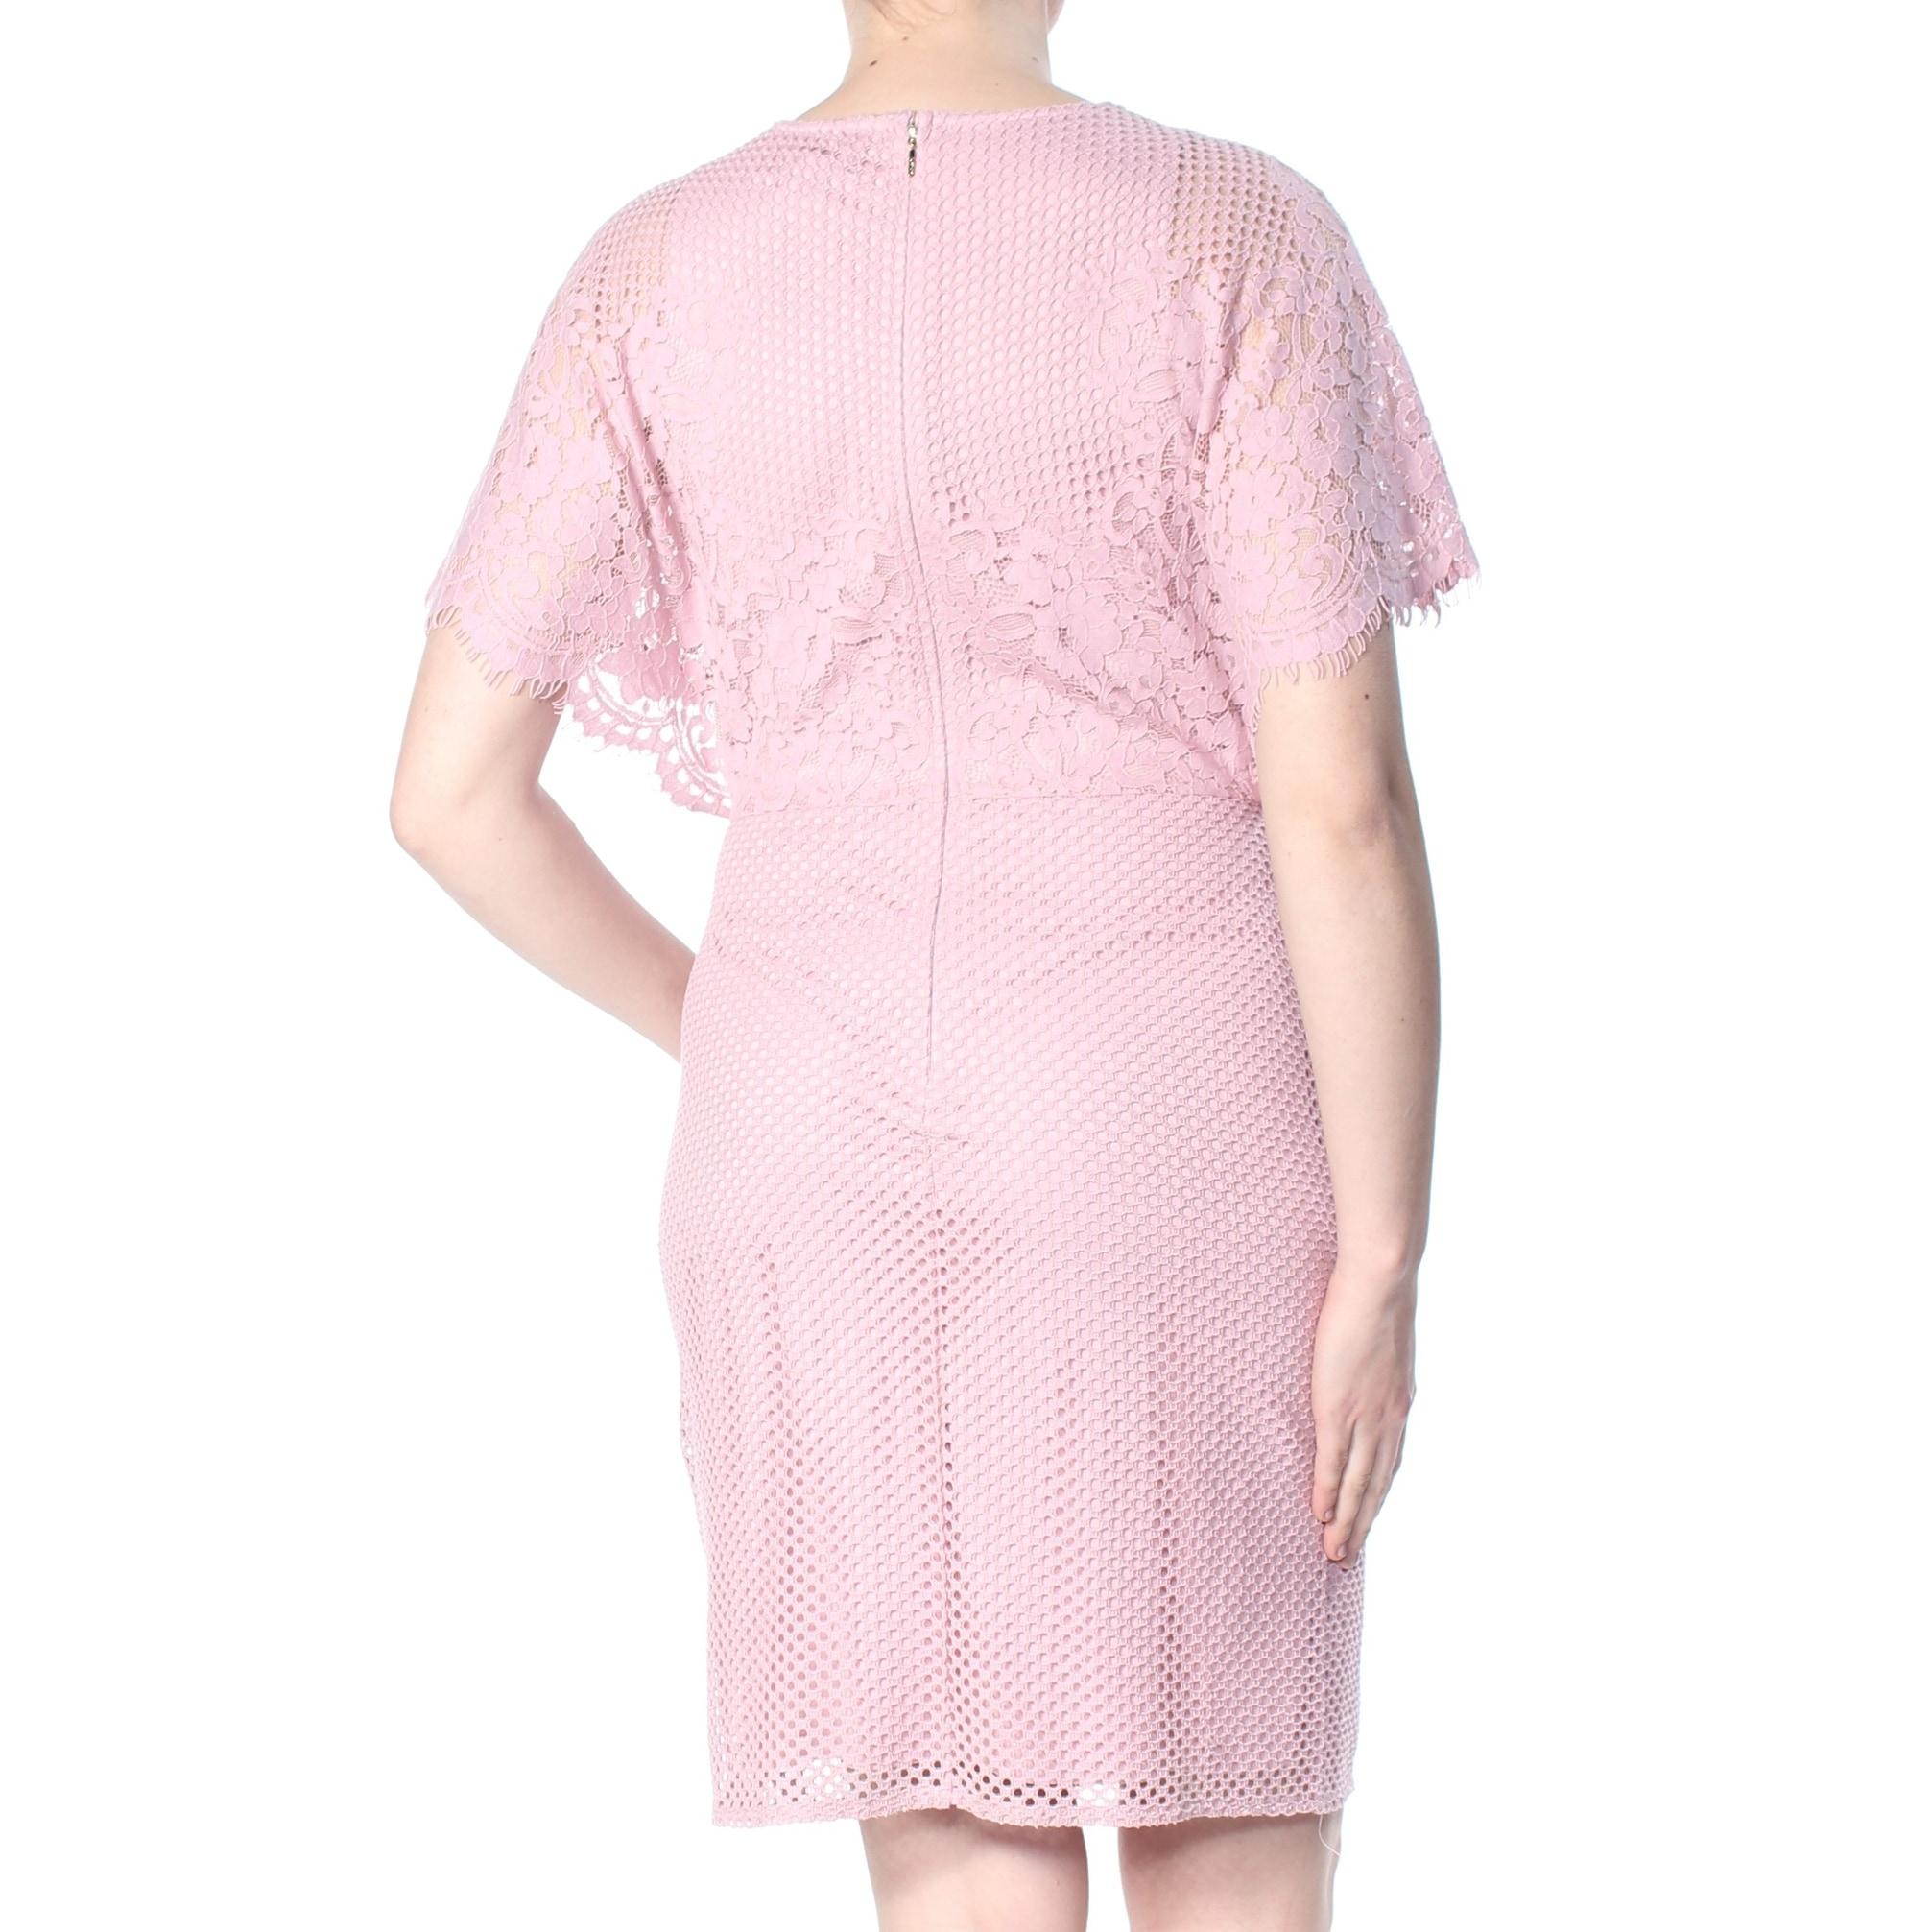 Dkny Womens Pink Lace Flutter Sleeve Jewel Neck Knee Length Sheath Formal Dress Size 12